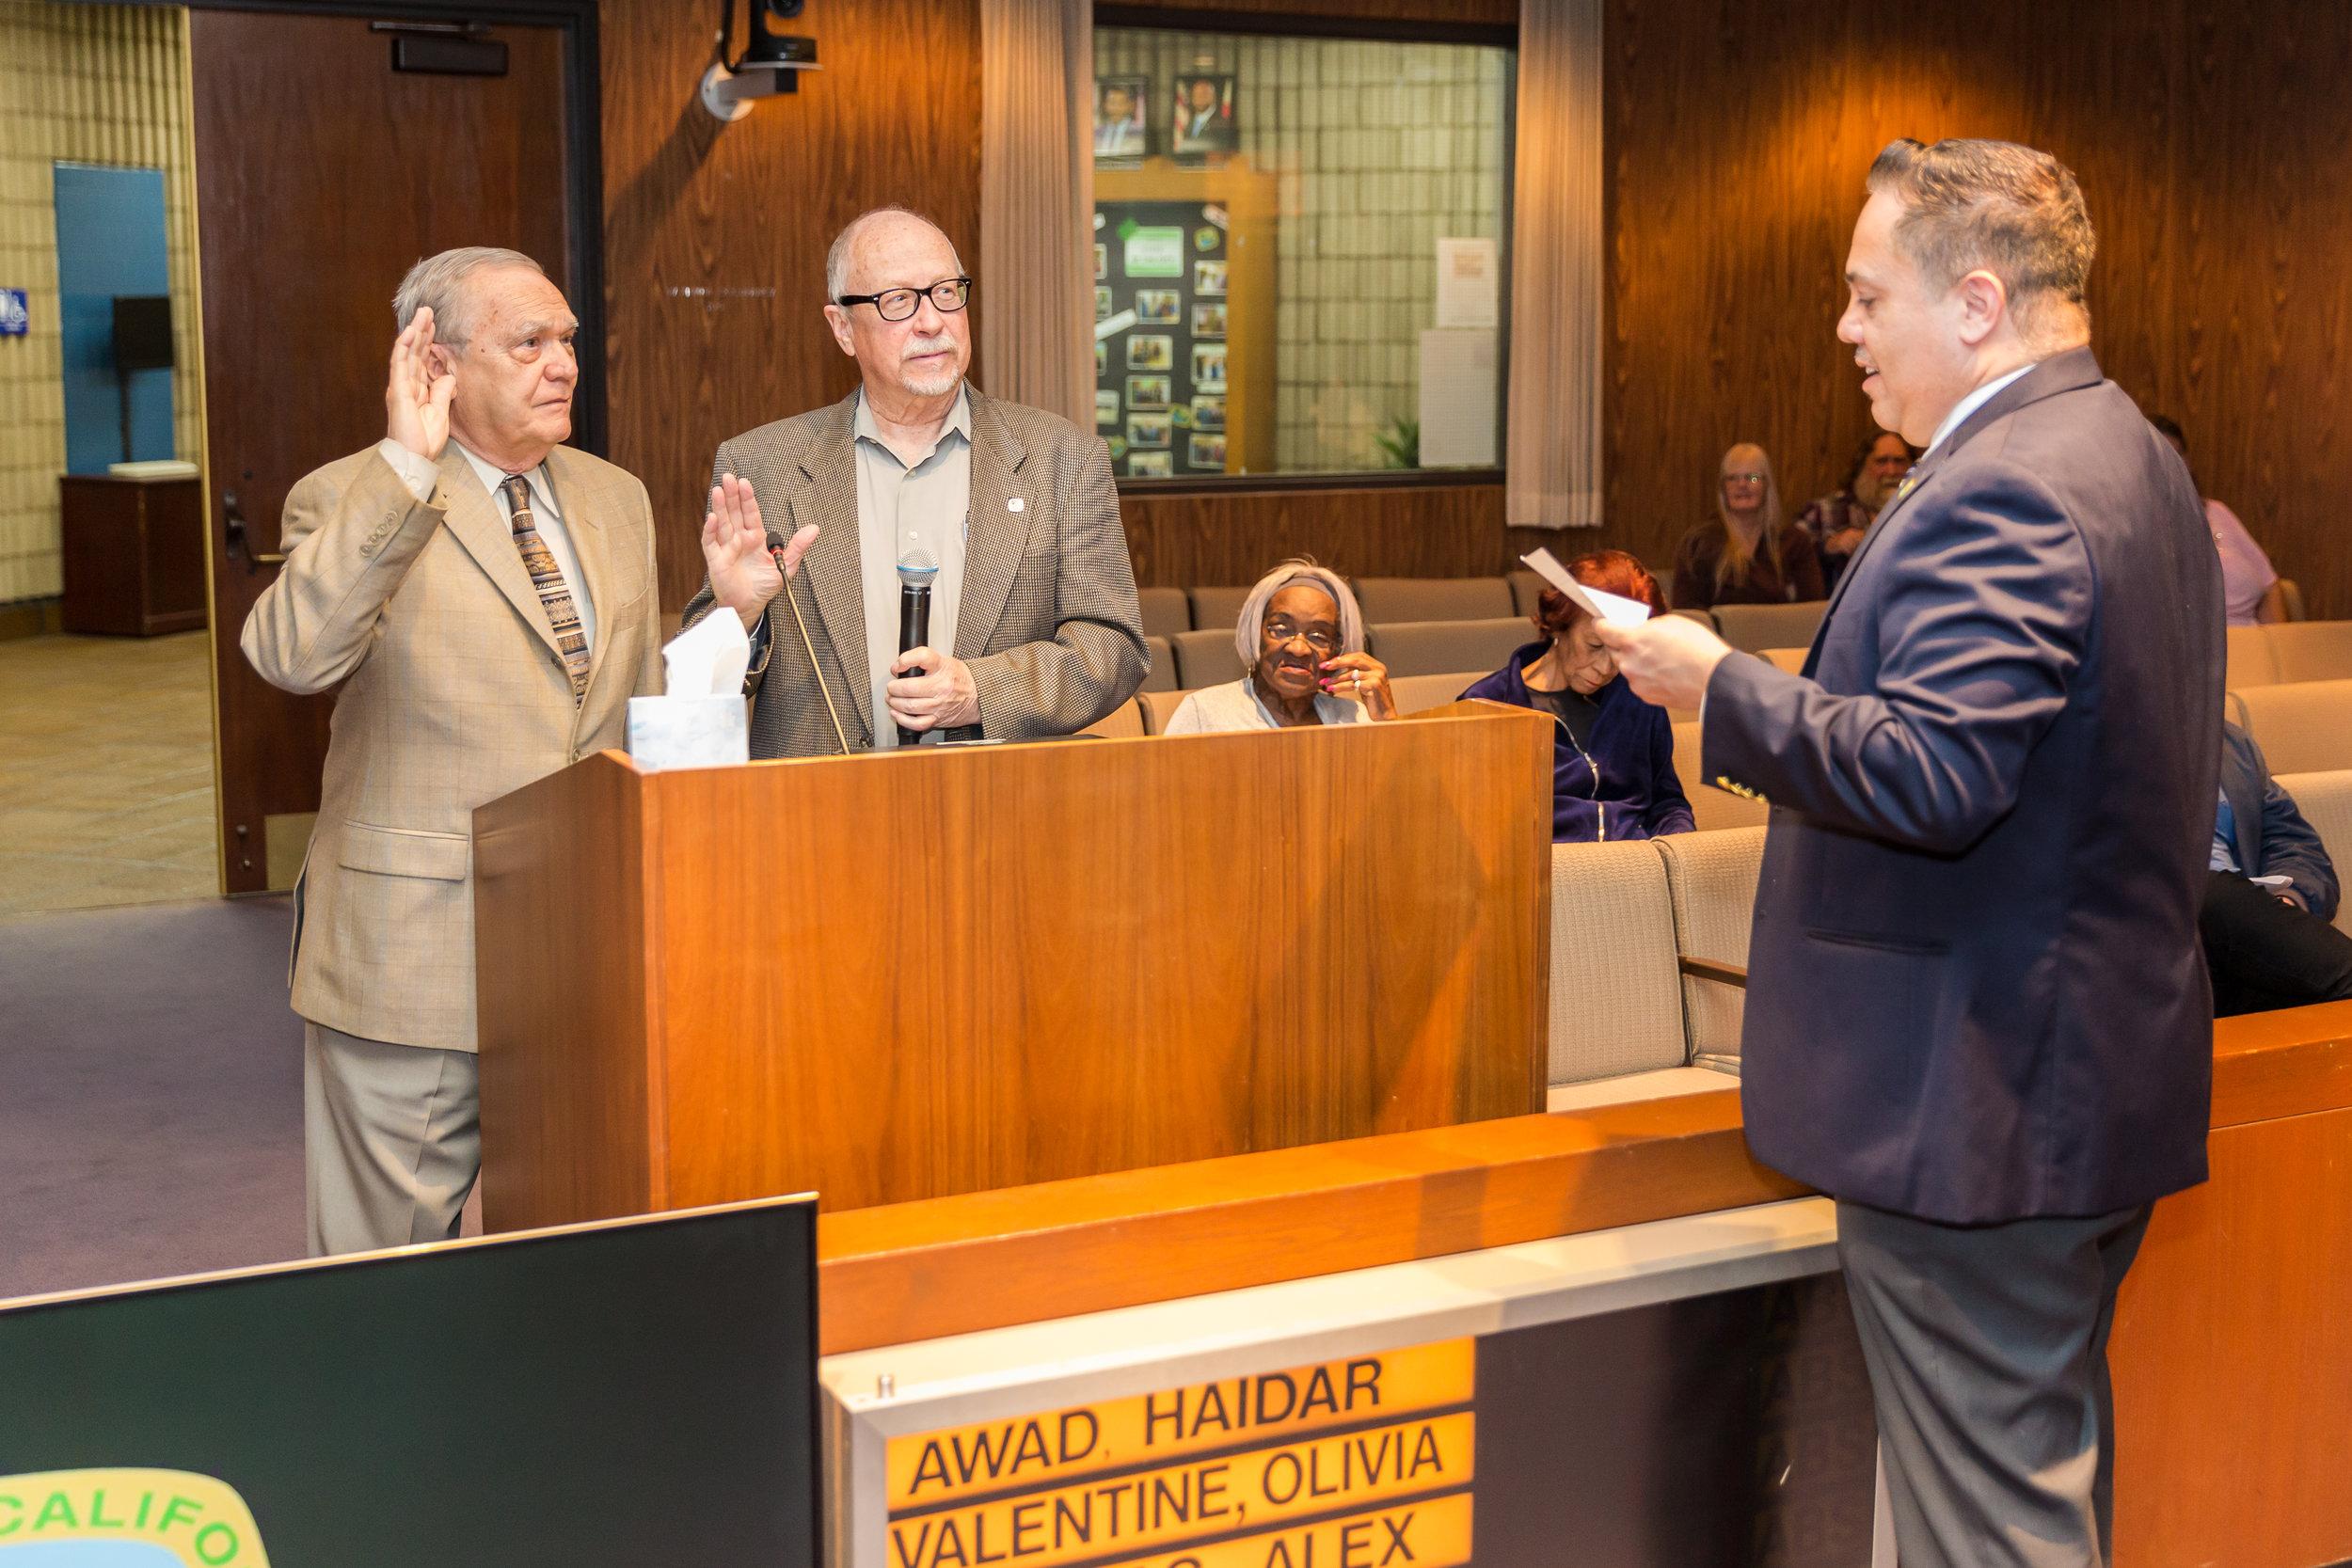 Manuel Balboa, Donald Harris and Mayor Vargas